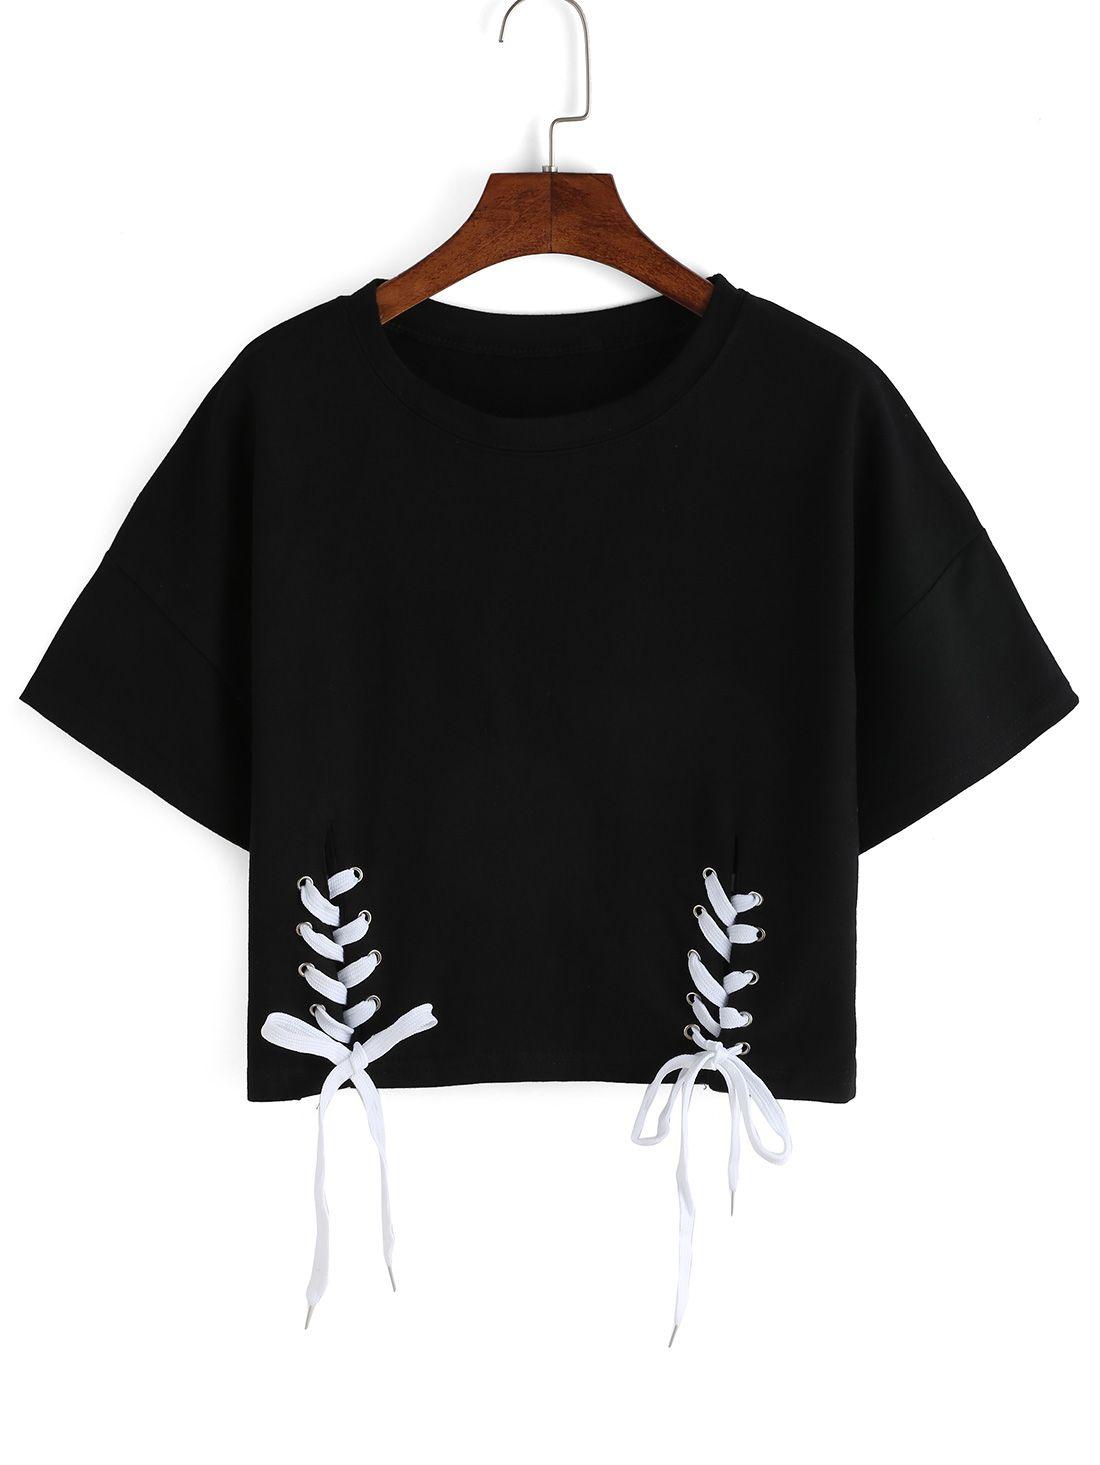 Women/'s T-Shirt Cropped Top Rock Chick Motif Party Slogan Print Lace Up Crop